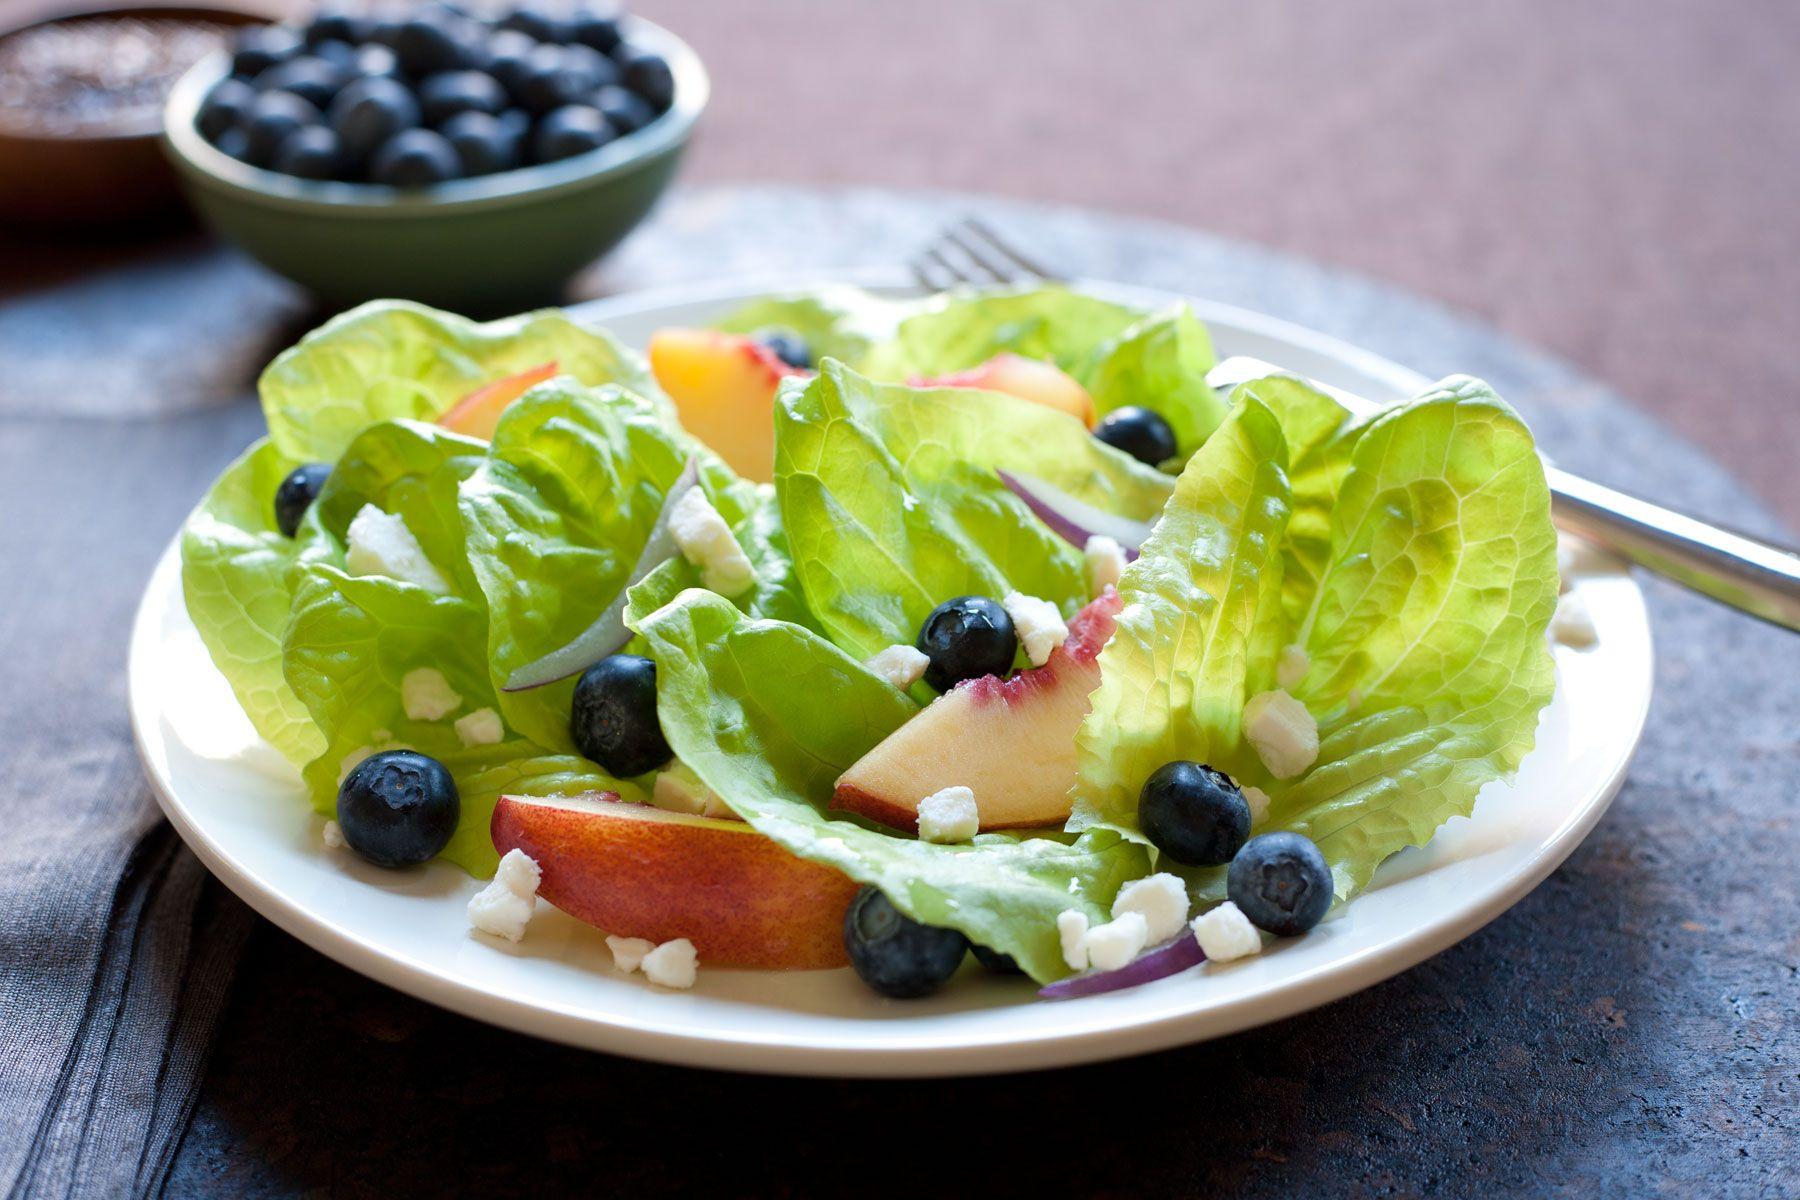 Blueberry and nectarine salad